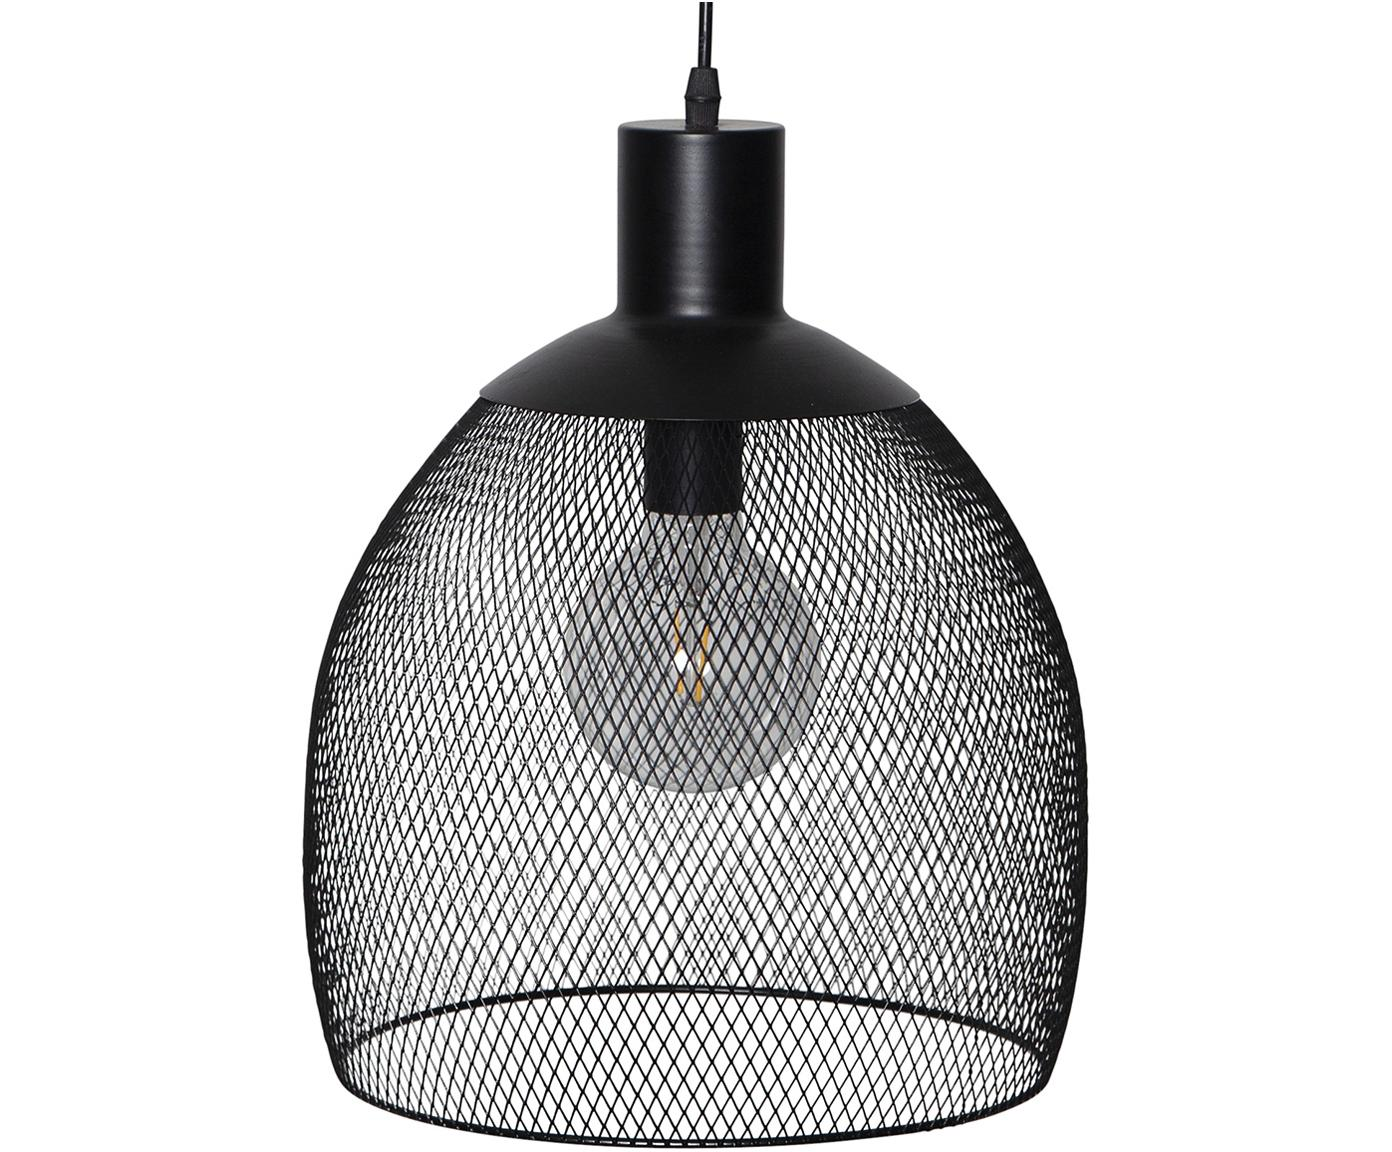 Solar outdoor LED lamp Sunlight, Metall, Kunststoff, Zwart, Ø 29 x H 35 cm